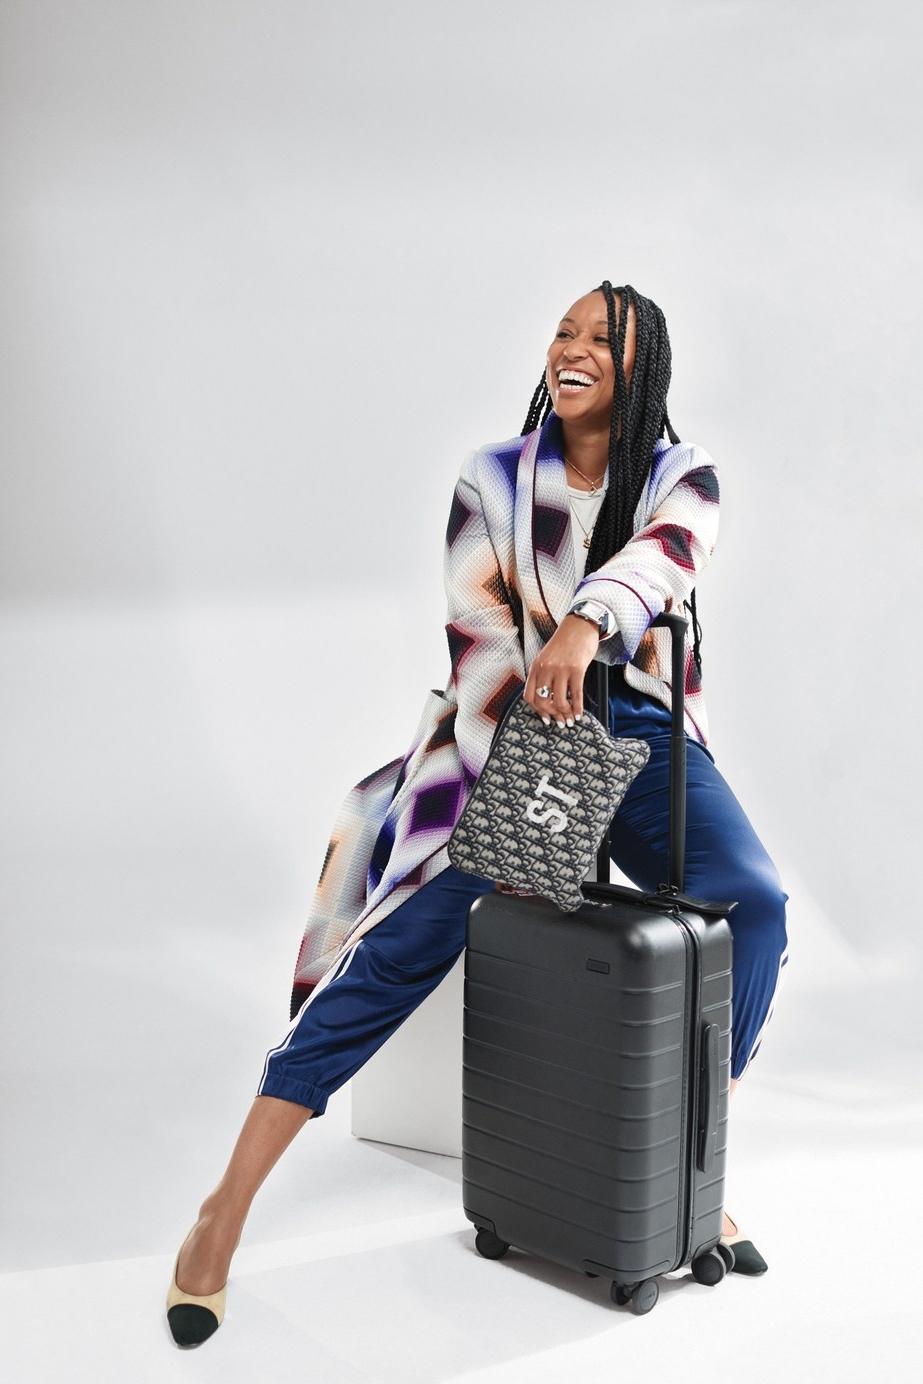 Why Travelers Should Always Talk to Strangers - Conde Nast Traveler